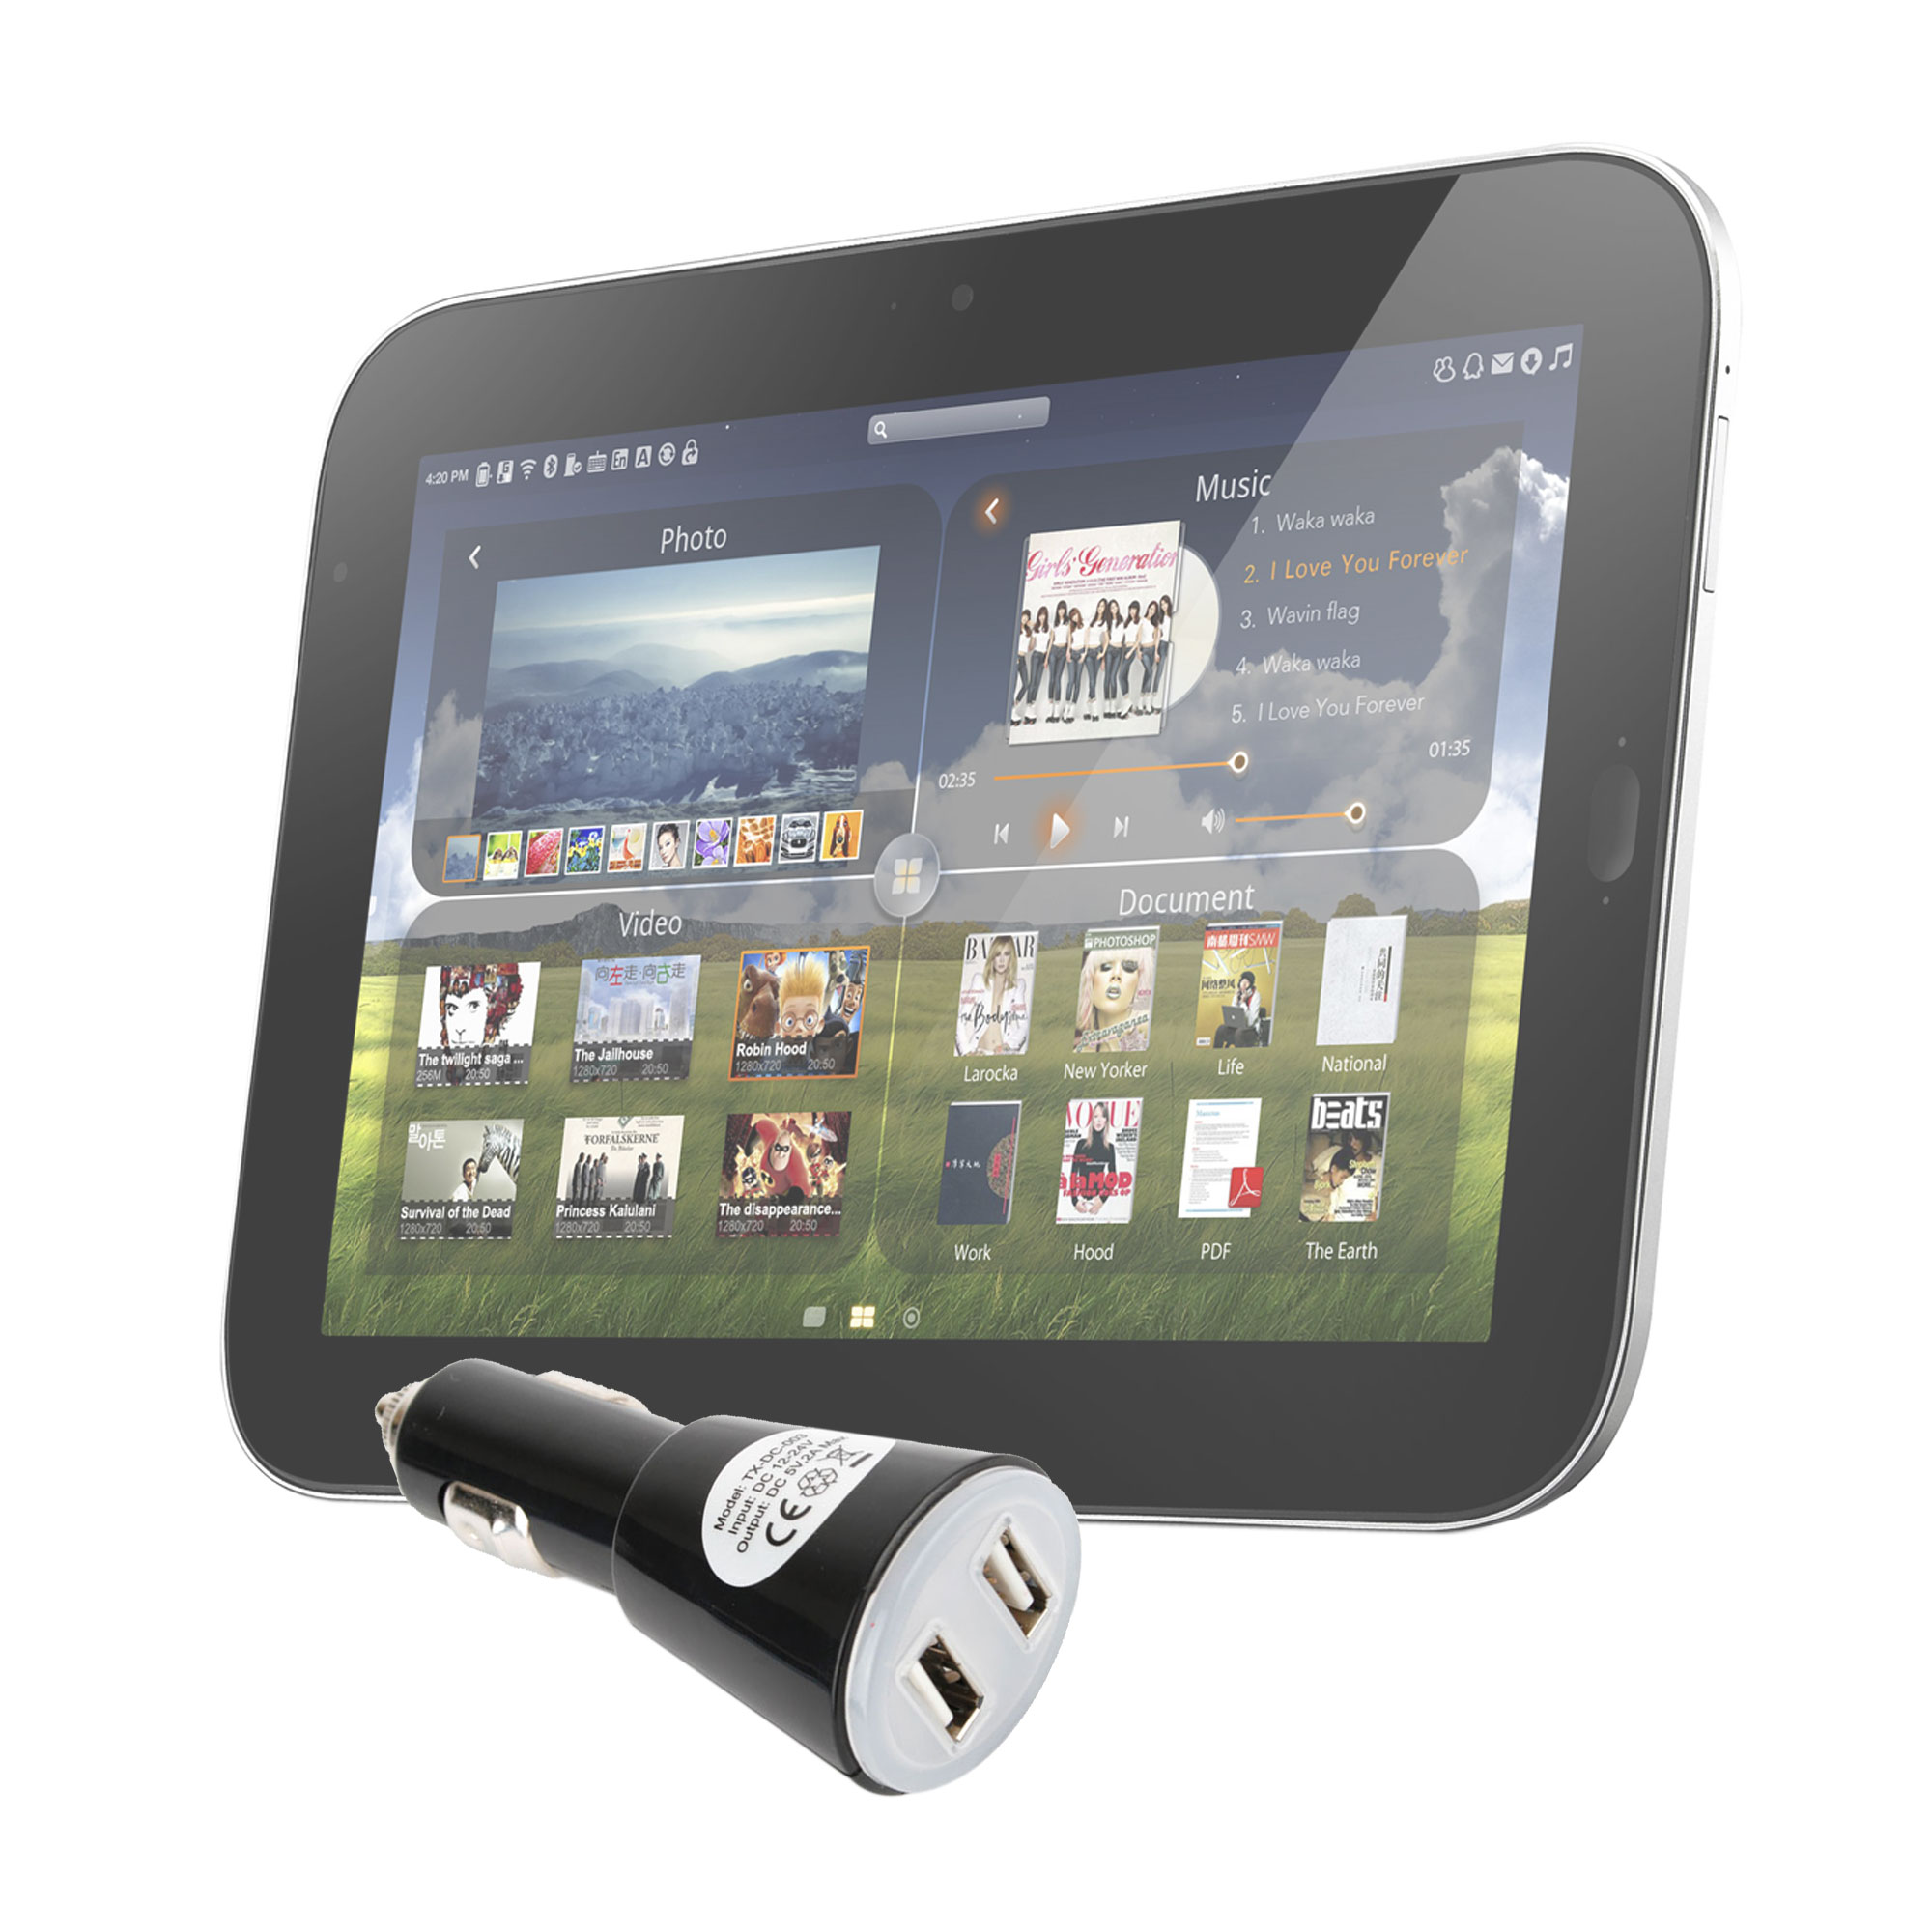 chargeur voiture usb pour tablettes lenovo thinkpad tablet ideapad k1 tablet ebay. Black Bedroom Furniture Sets. Home Design Ideas